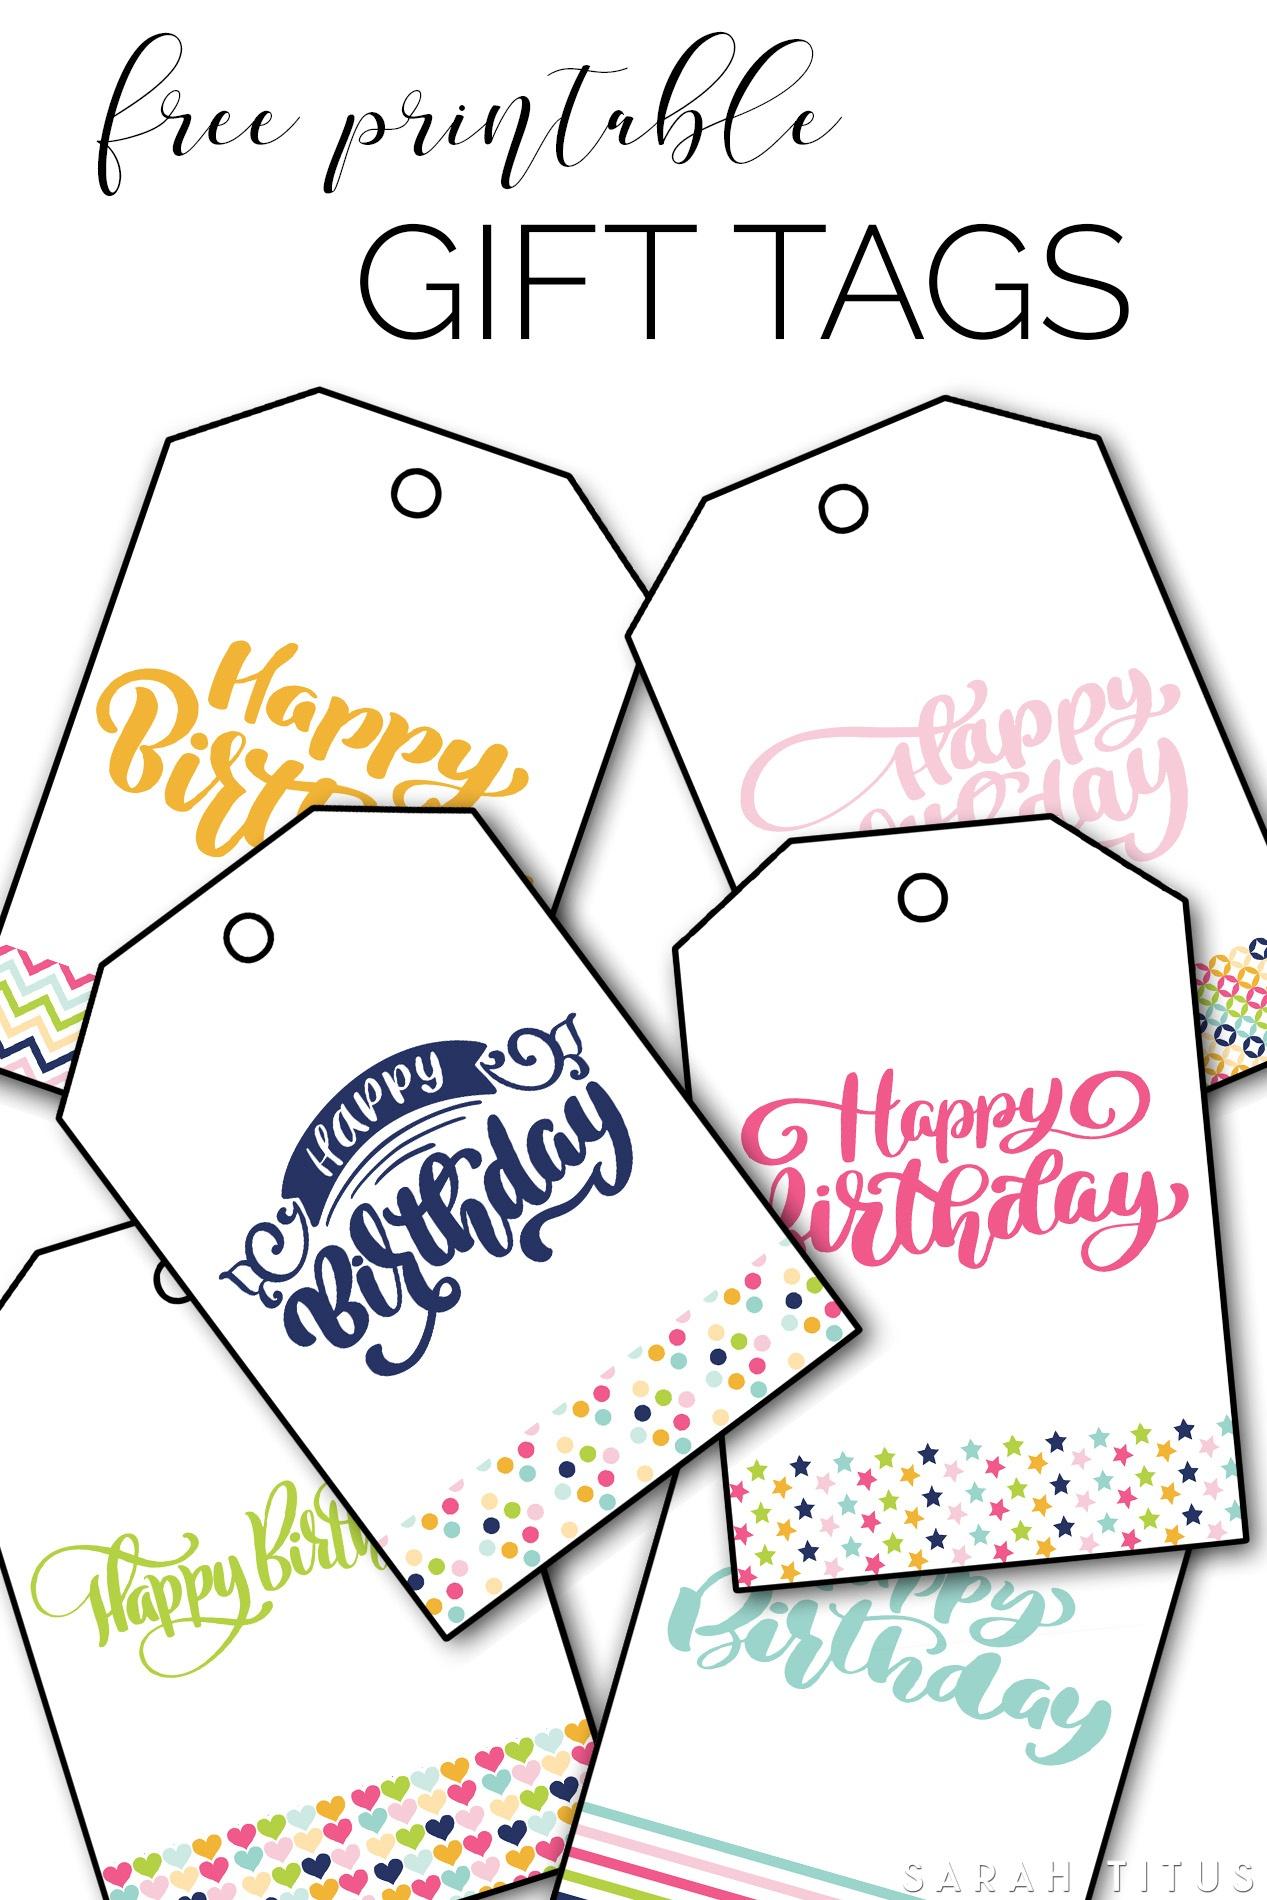 Free Printable Happy Birthday Gift Tags - Sarah Titus - Free Printable Birthday Tags